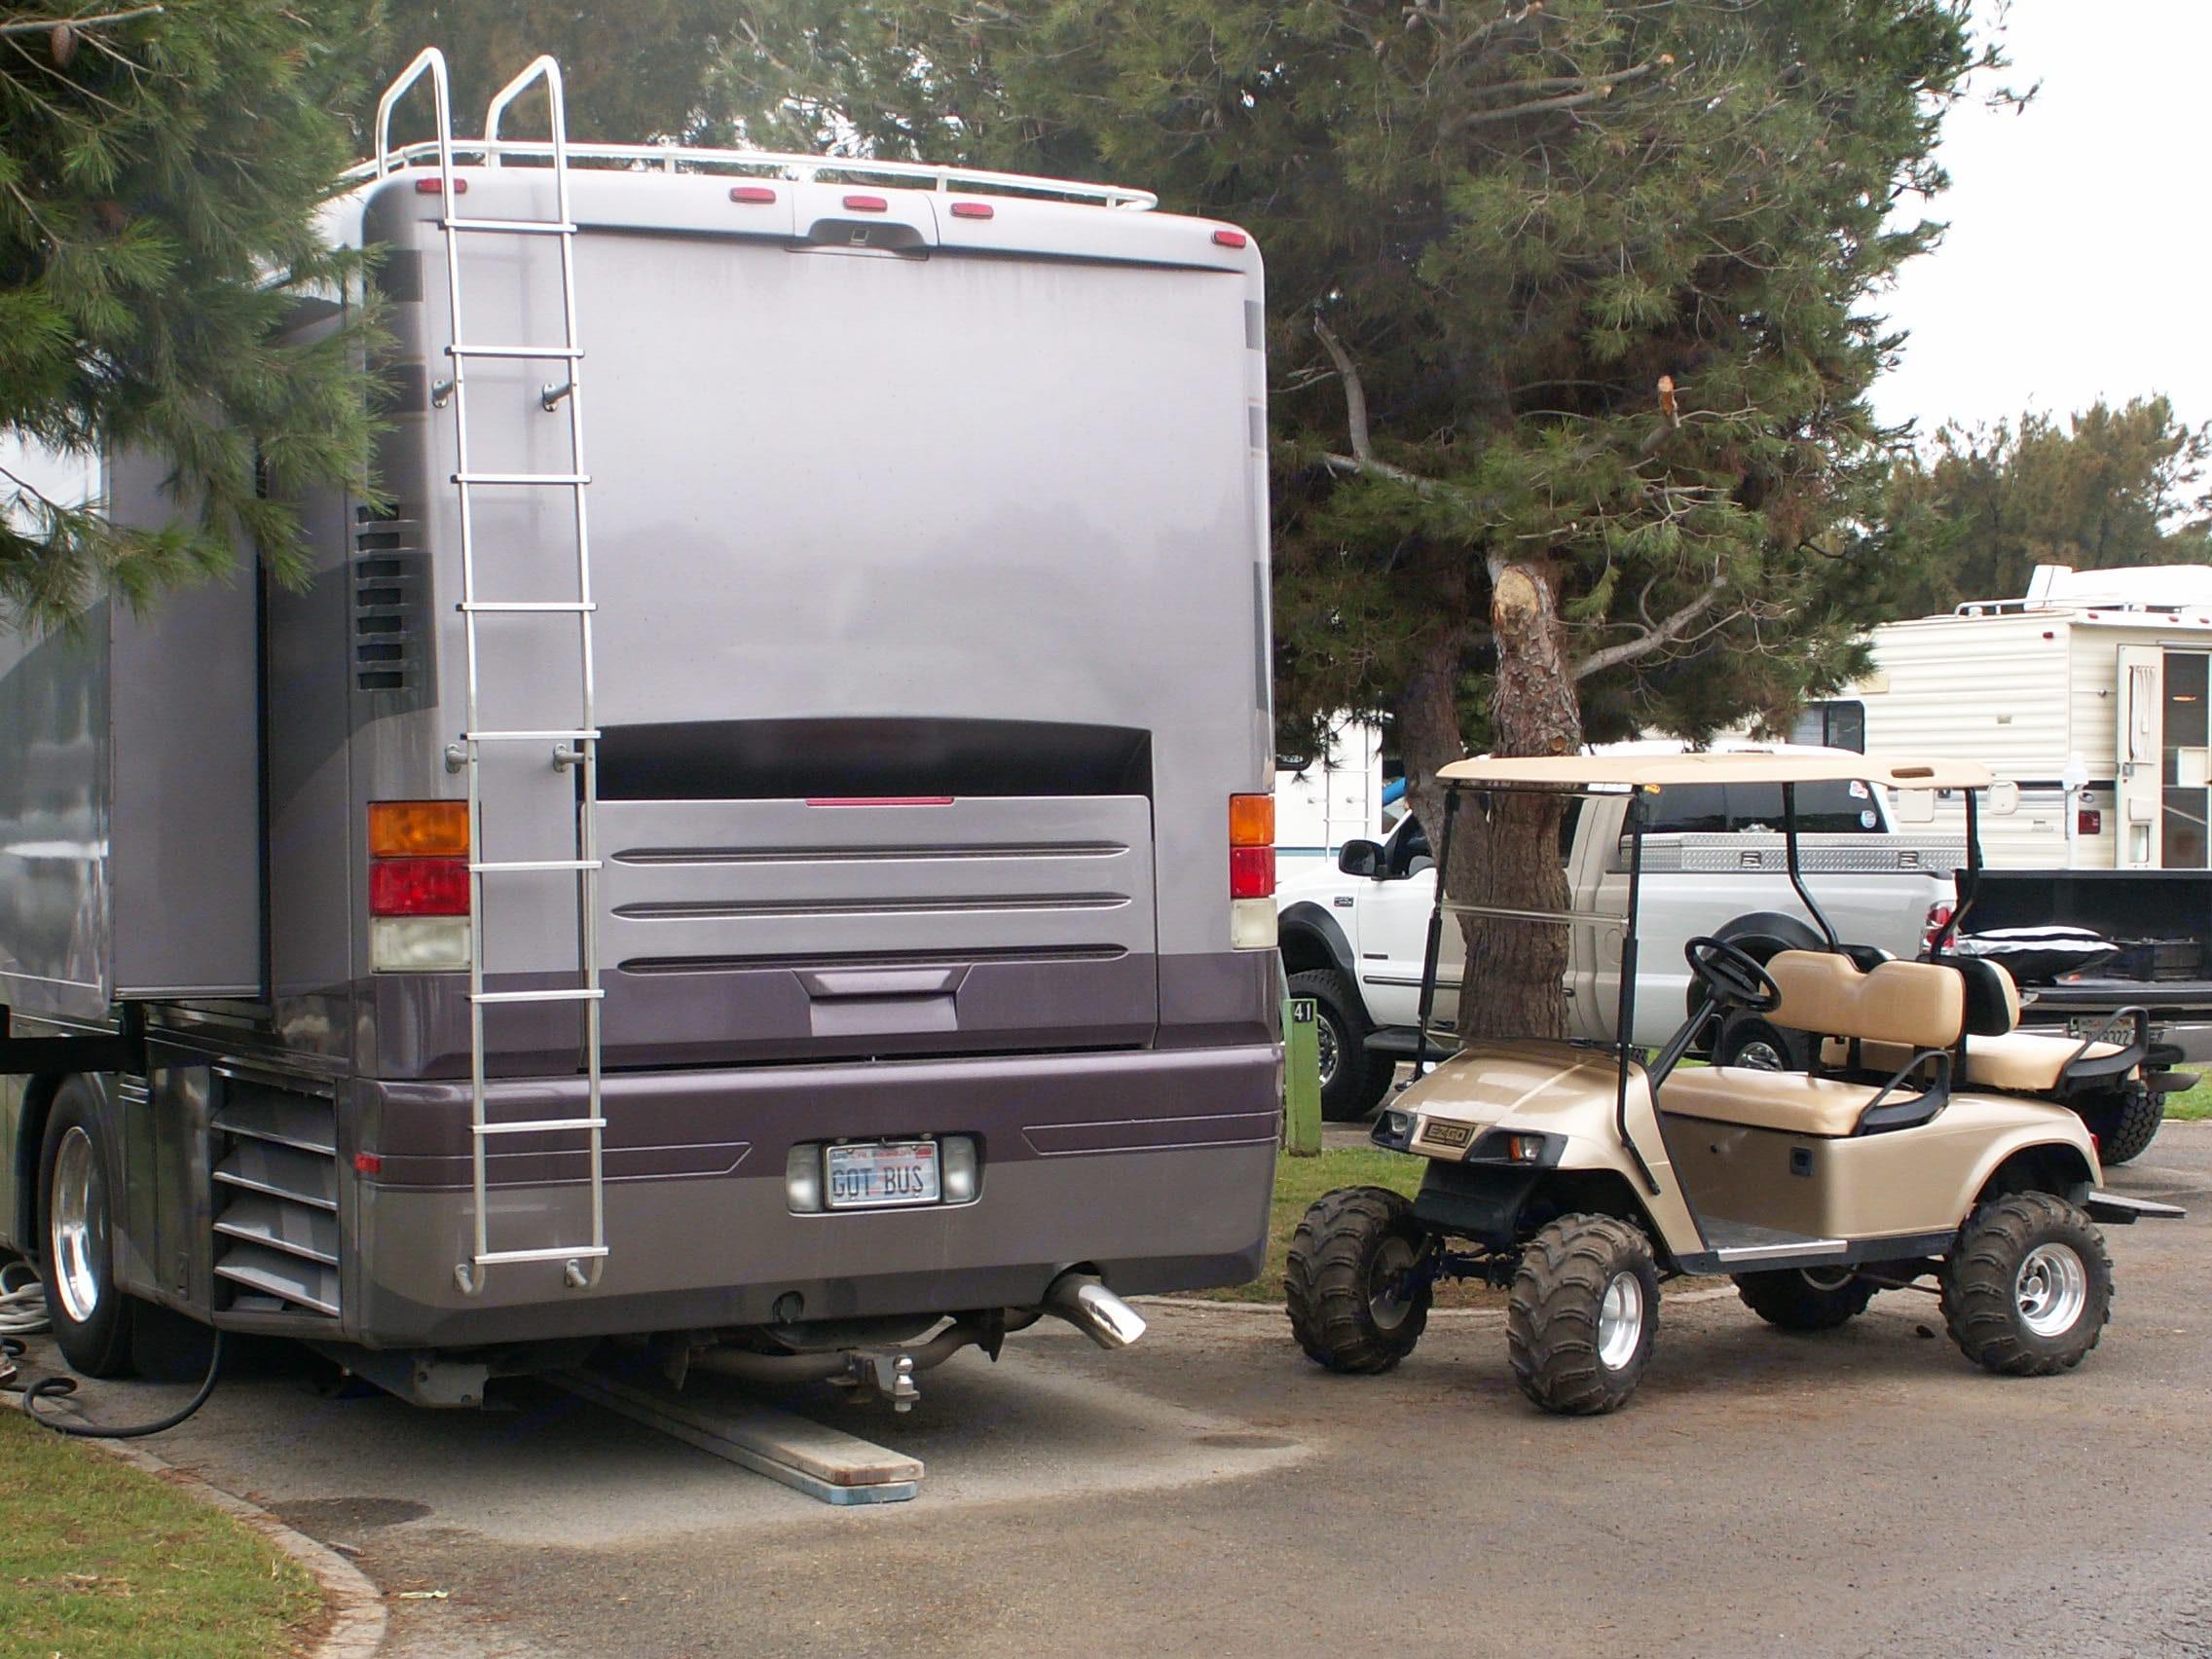 Spending time at Ventura RV Beach Park  Let the good times roll. Newmar Dutch Star 2001